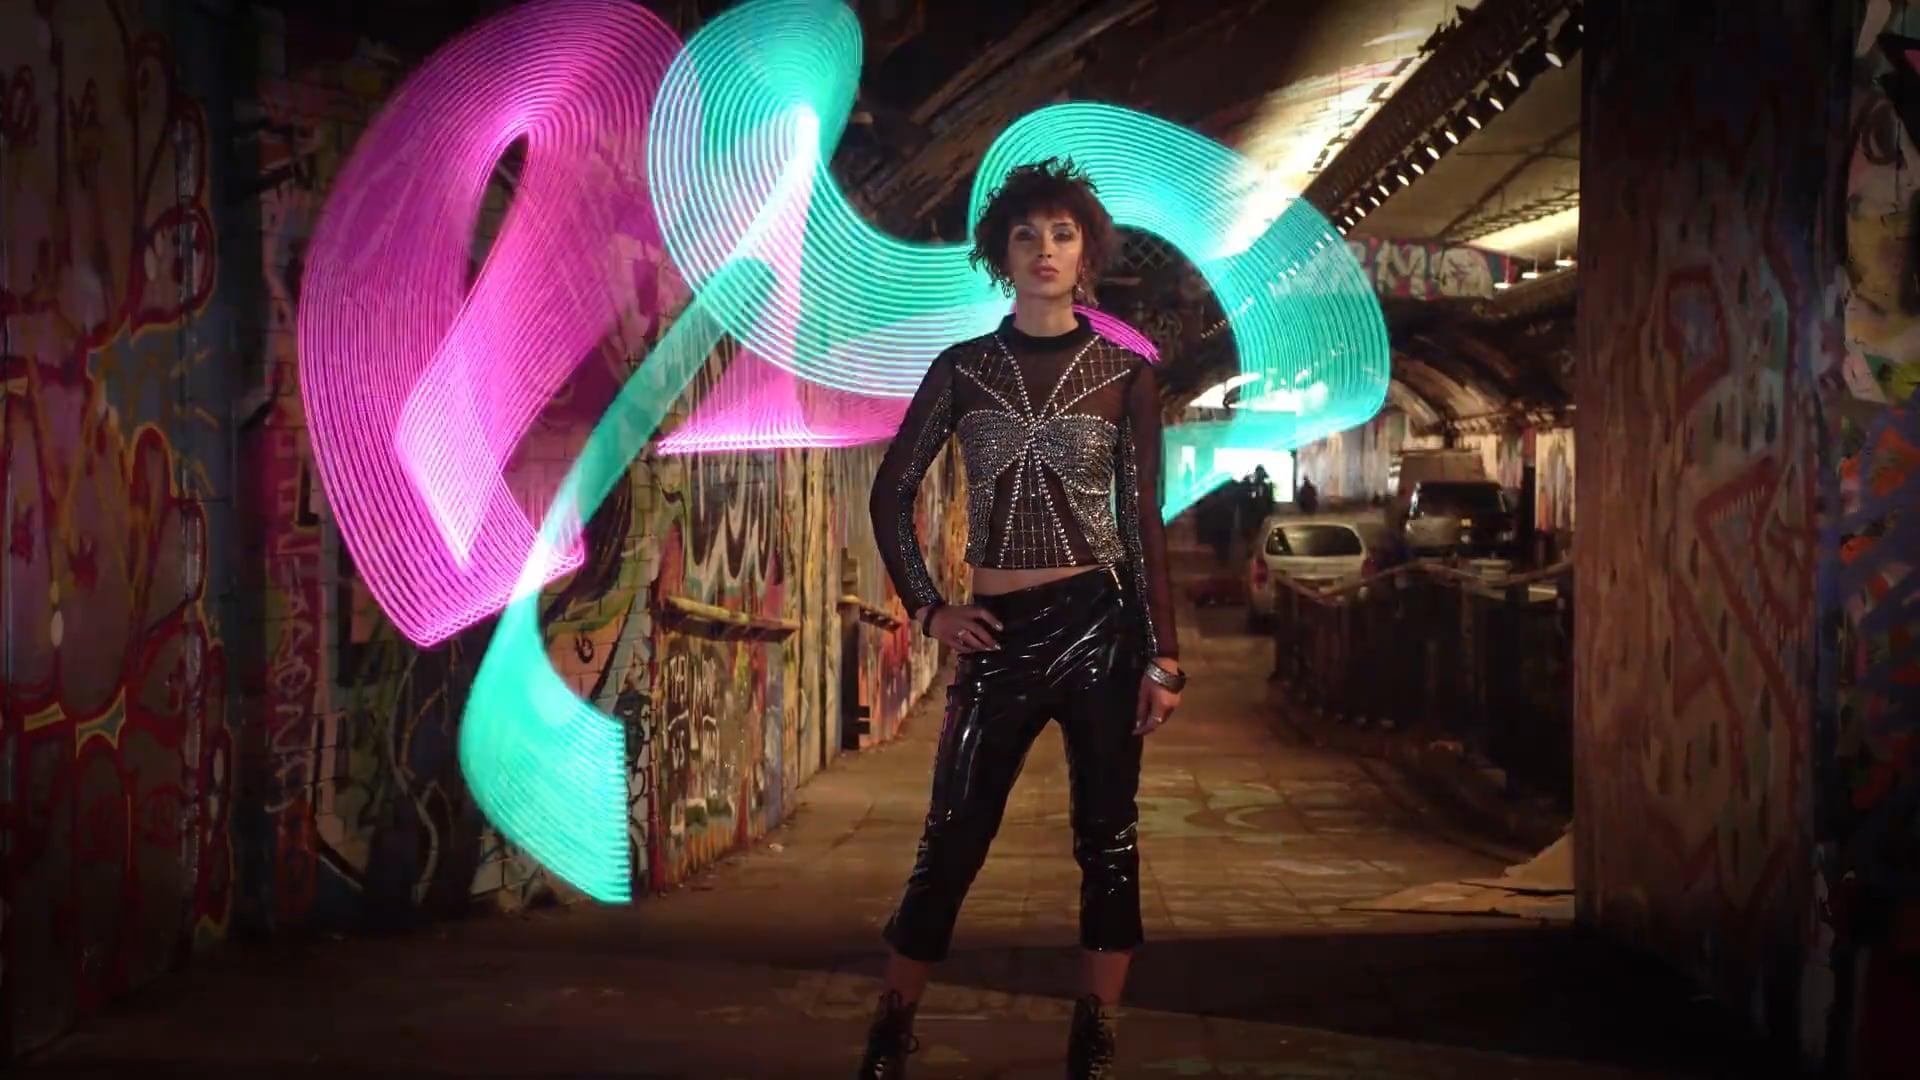 'See Ya Later' Music Video - Brooke Law